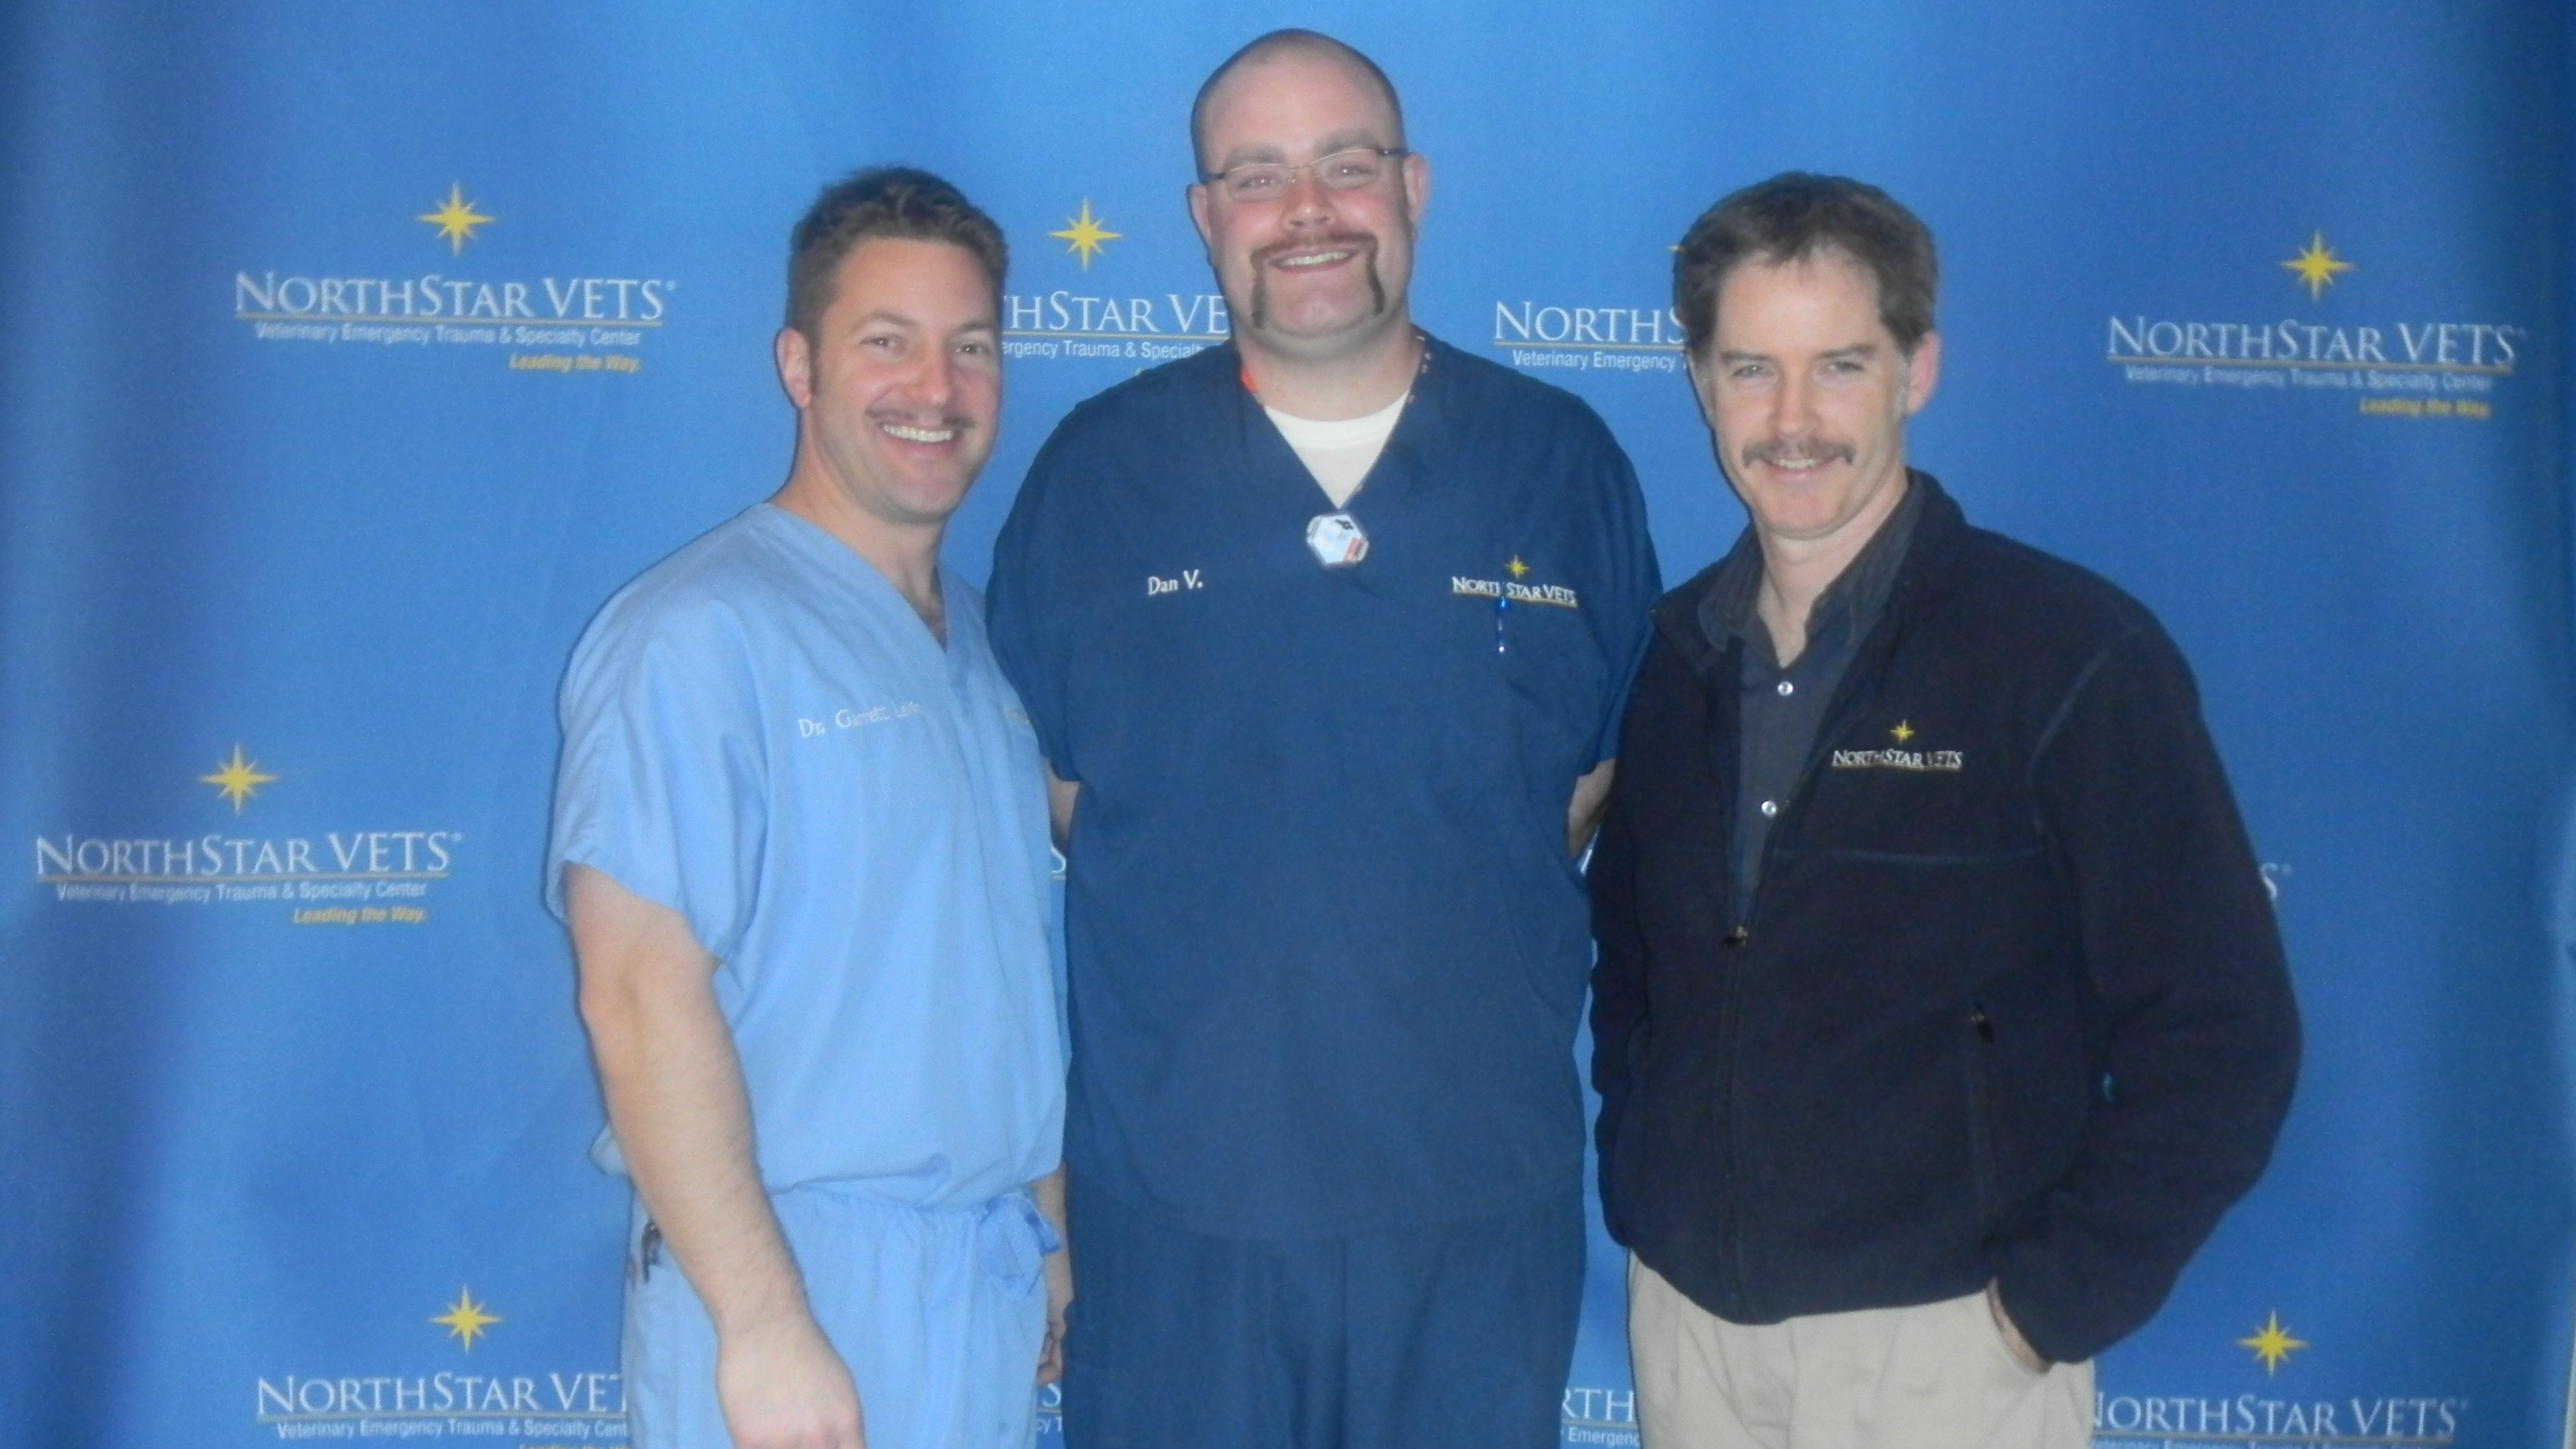 (from left to right) Dr. Garrett Levin, Dan Vinai, Dr. George Motley